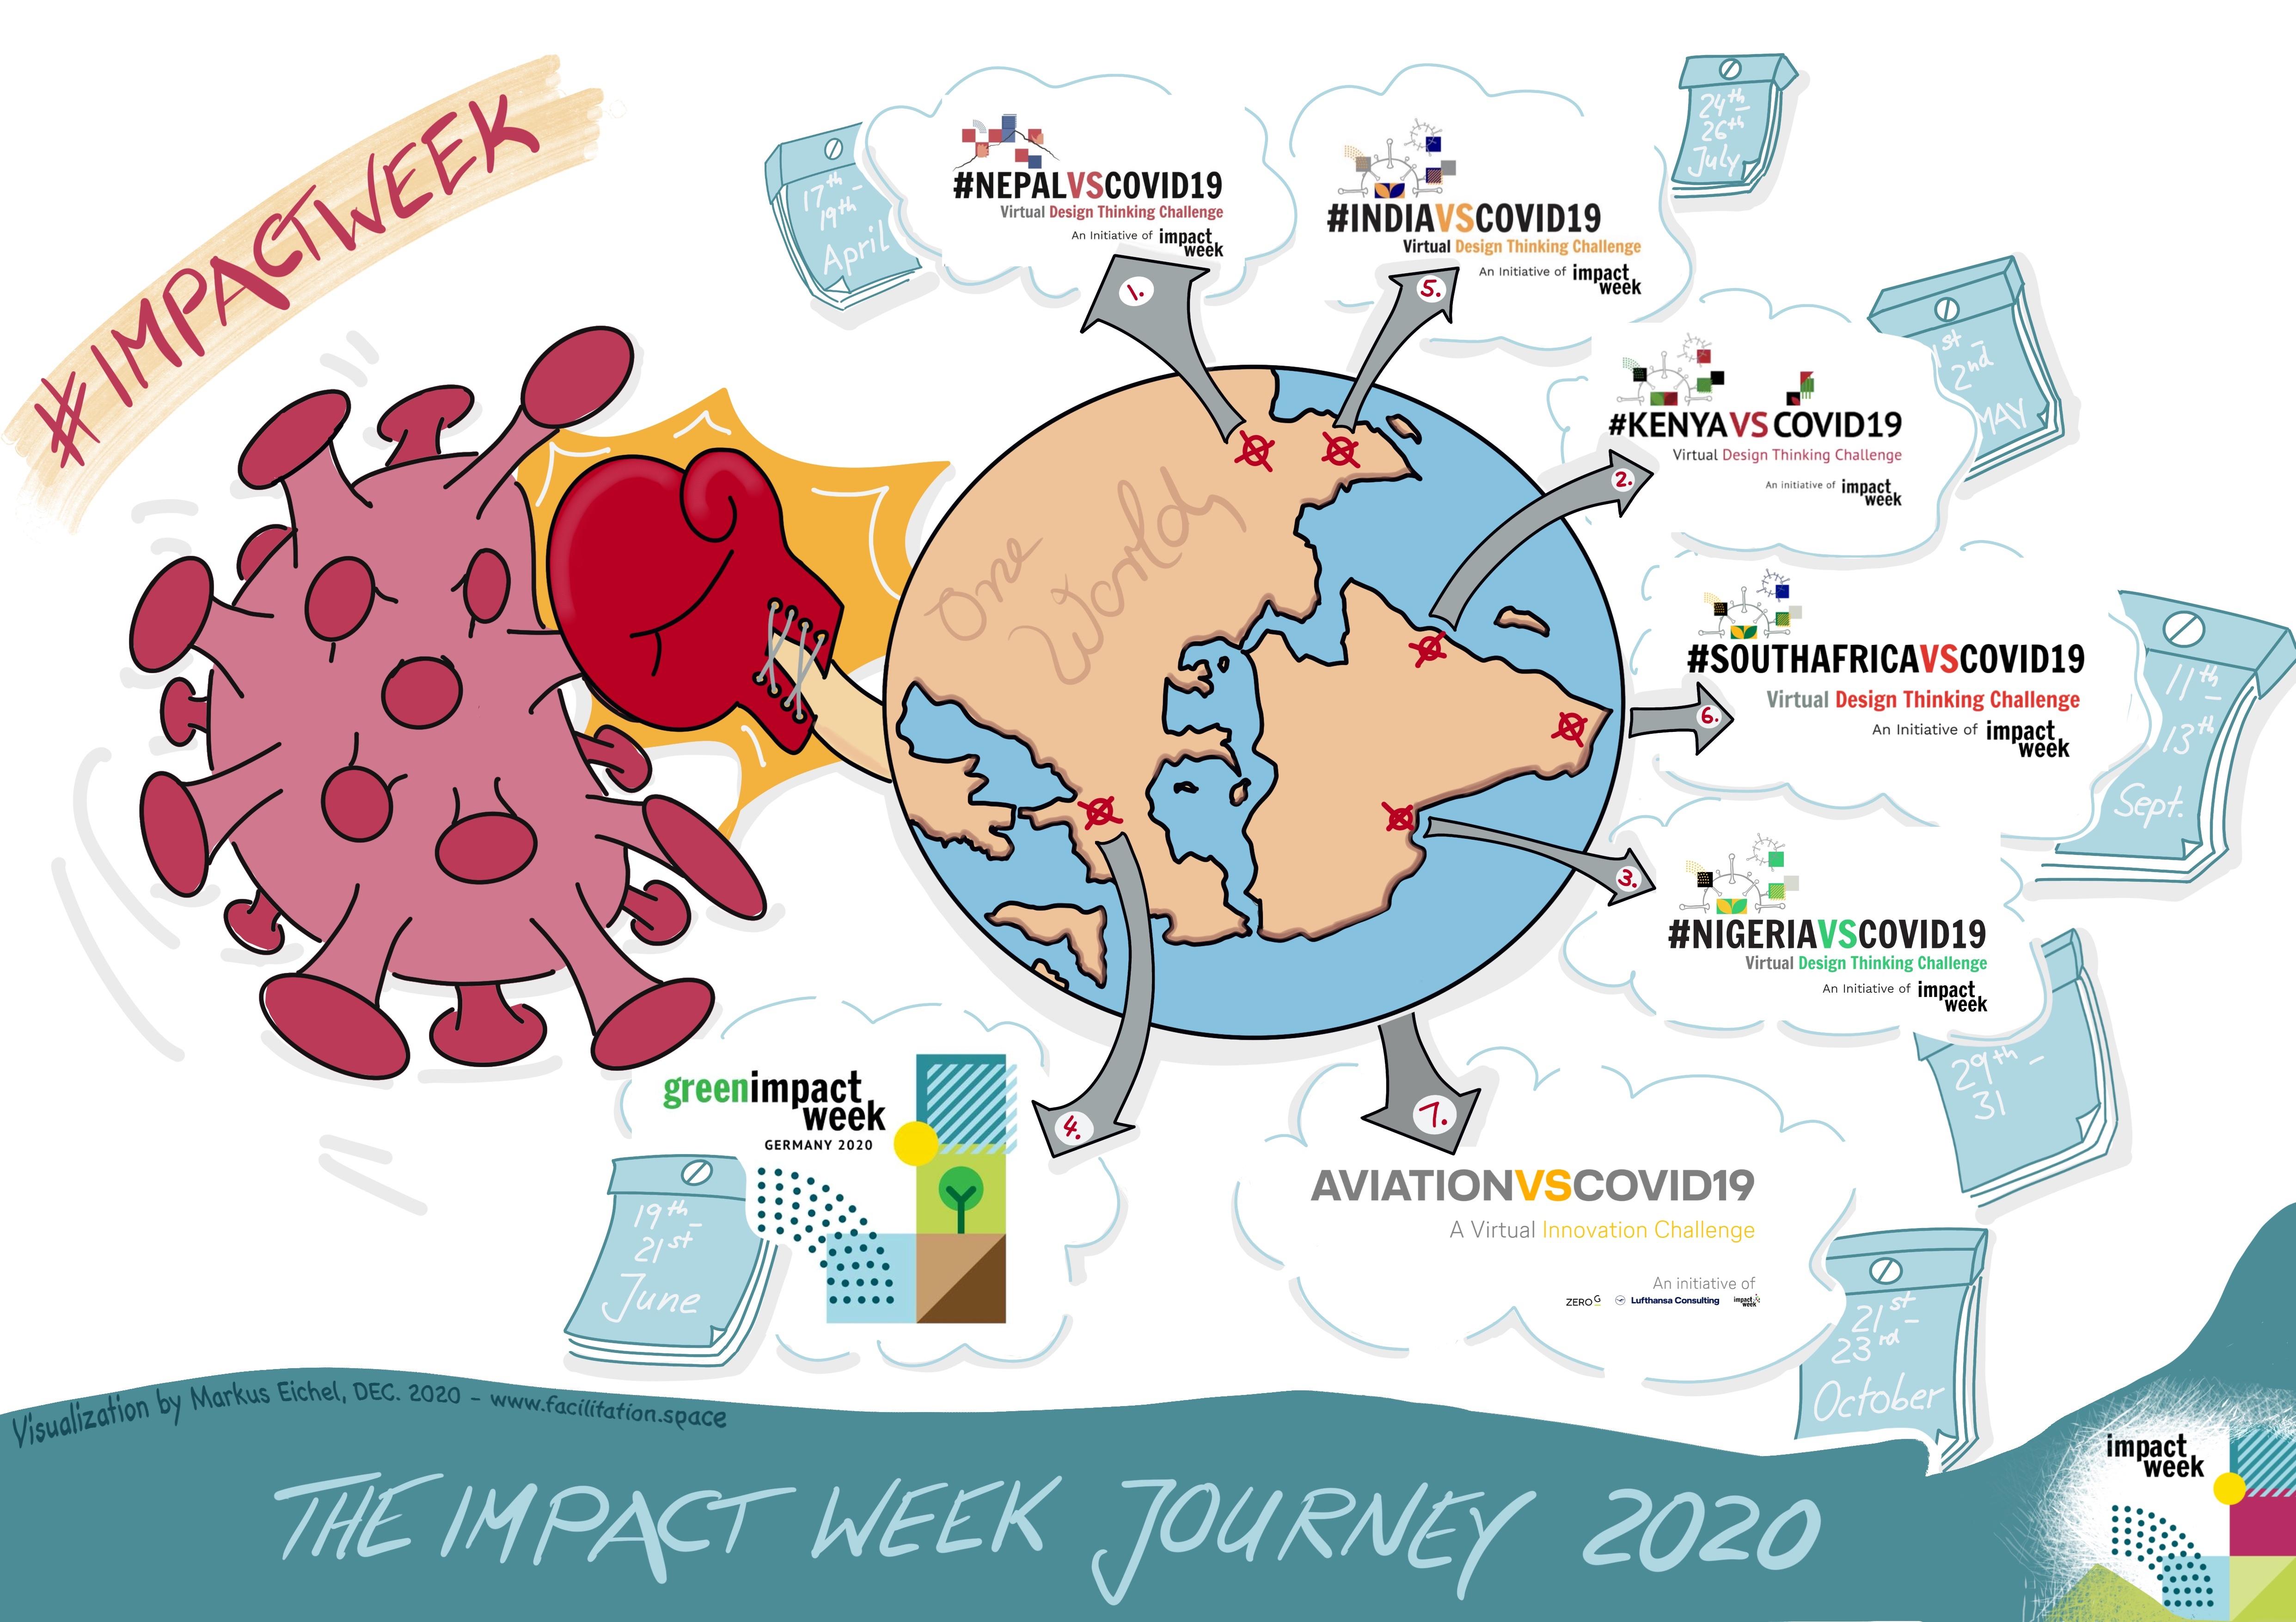 The Impact Week Journey 2020 - visualisation by Markus Eichel www.facilitation.space